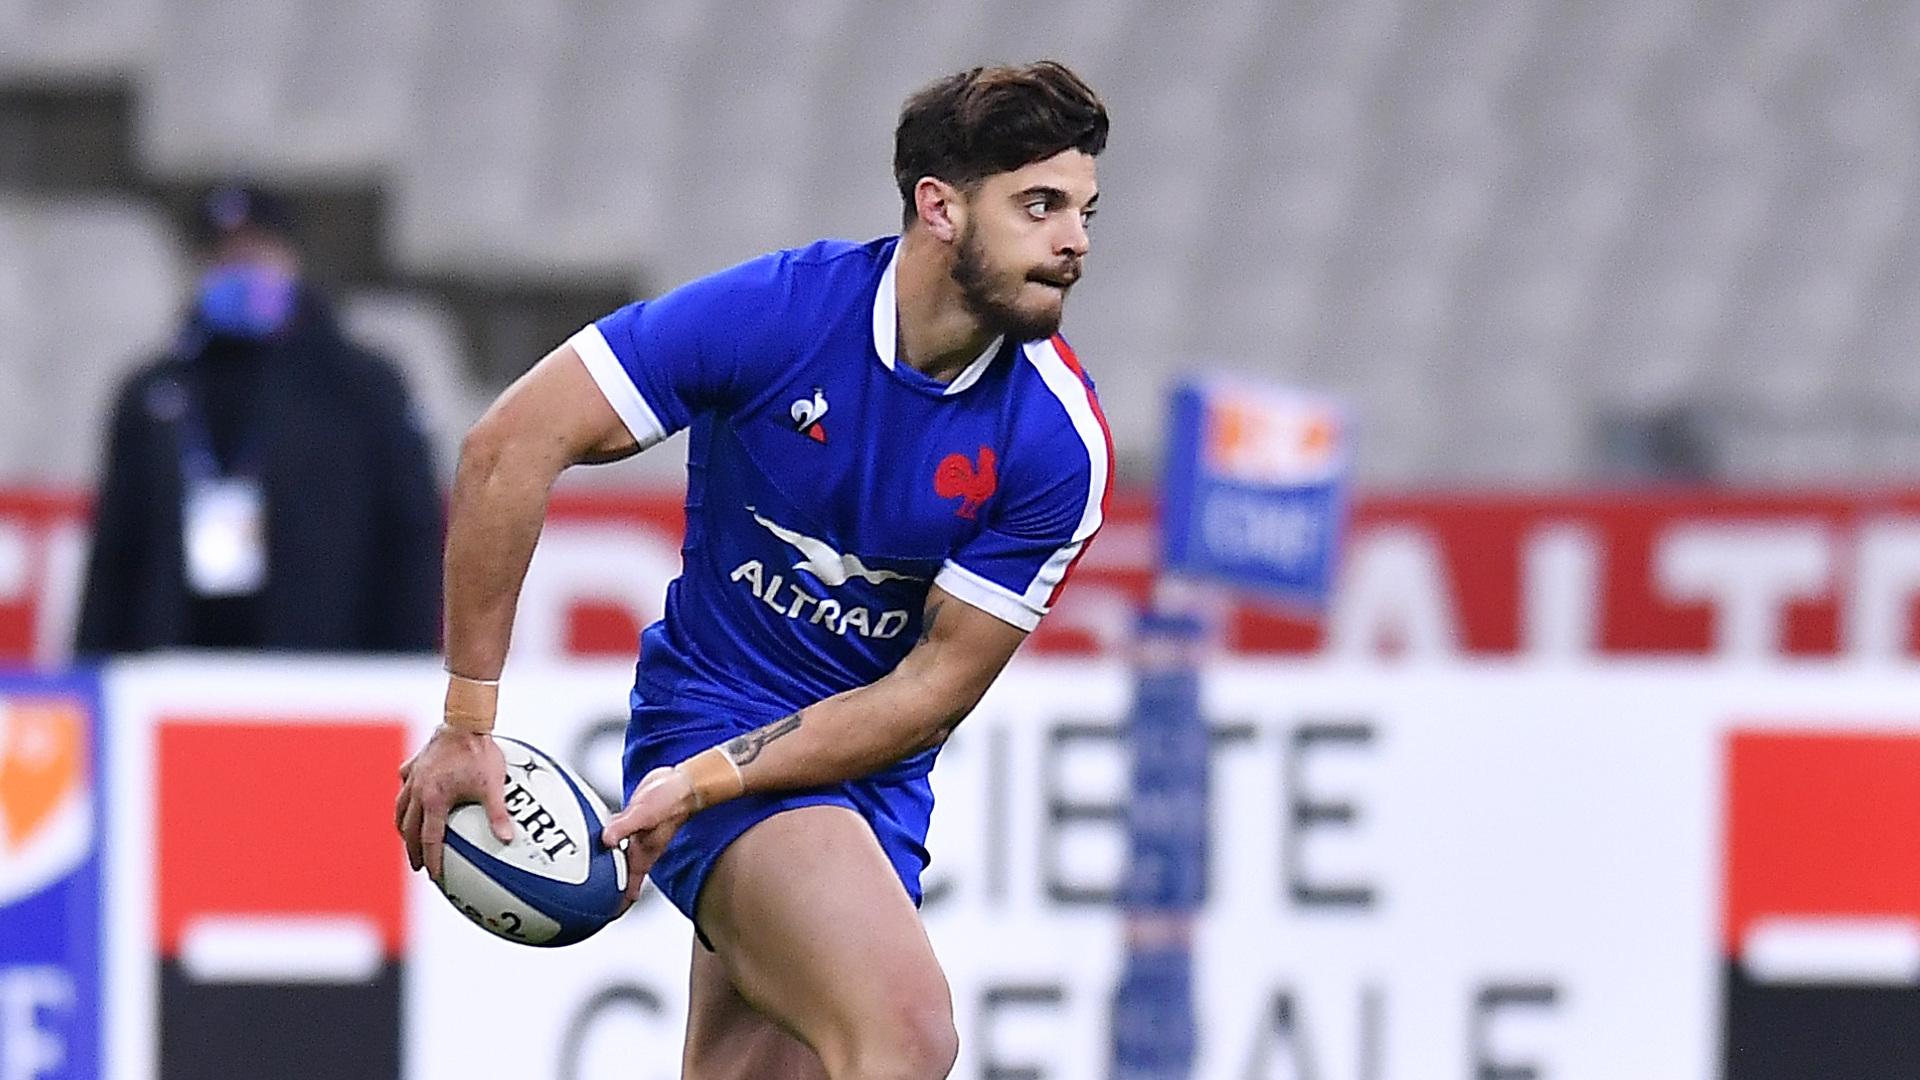 Six Nations 2021: France star Ntamack back for Scotland showdown